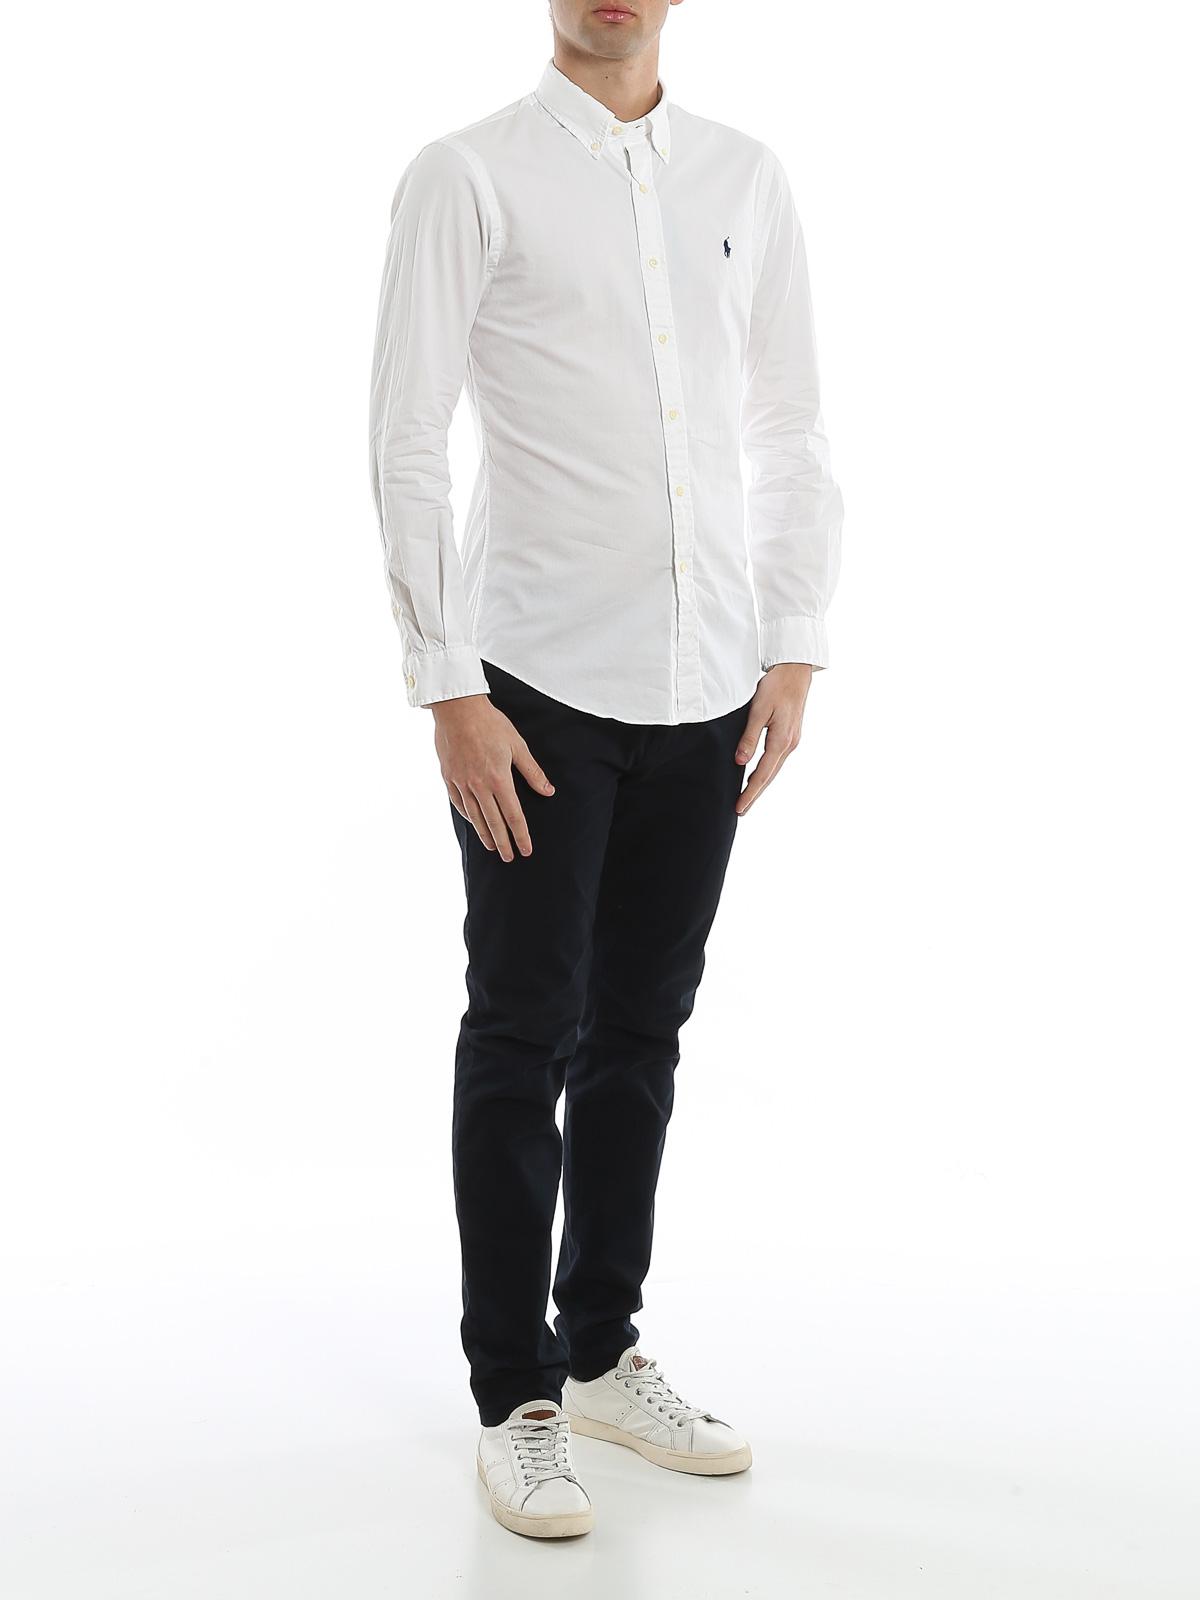 Immagine di POLO RALPH LAUREN | Camicie LONG SLEEVE SHIRT